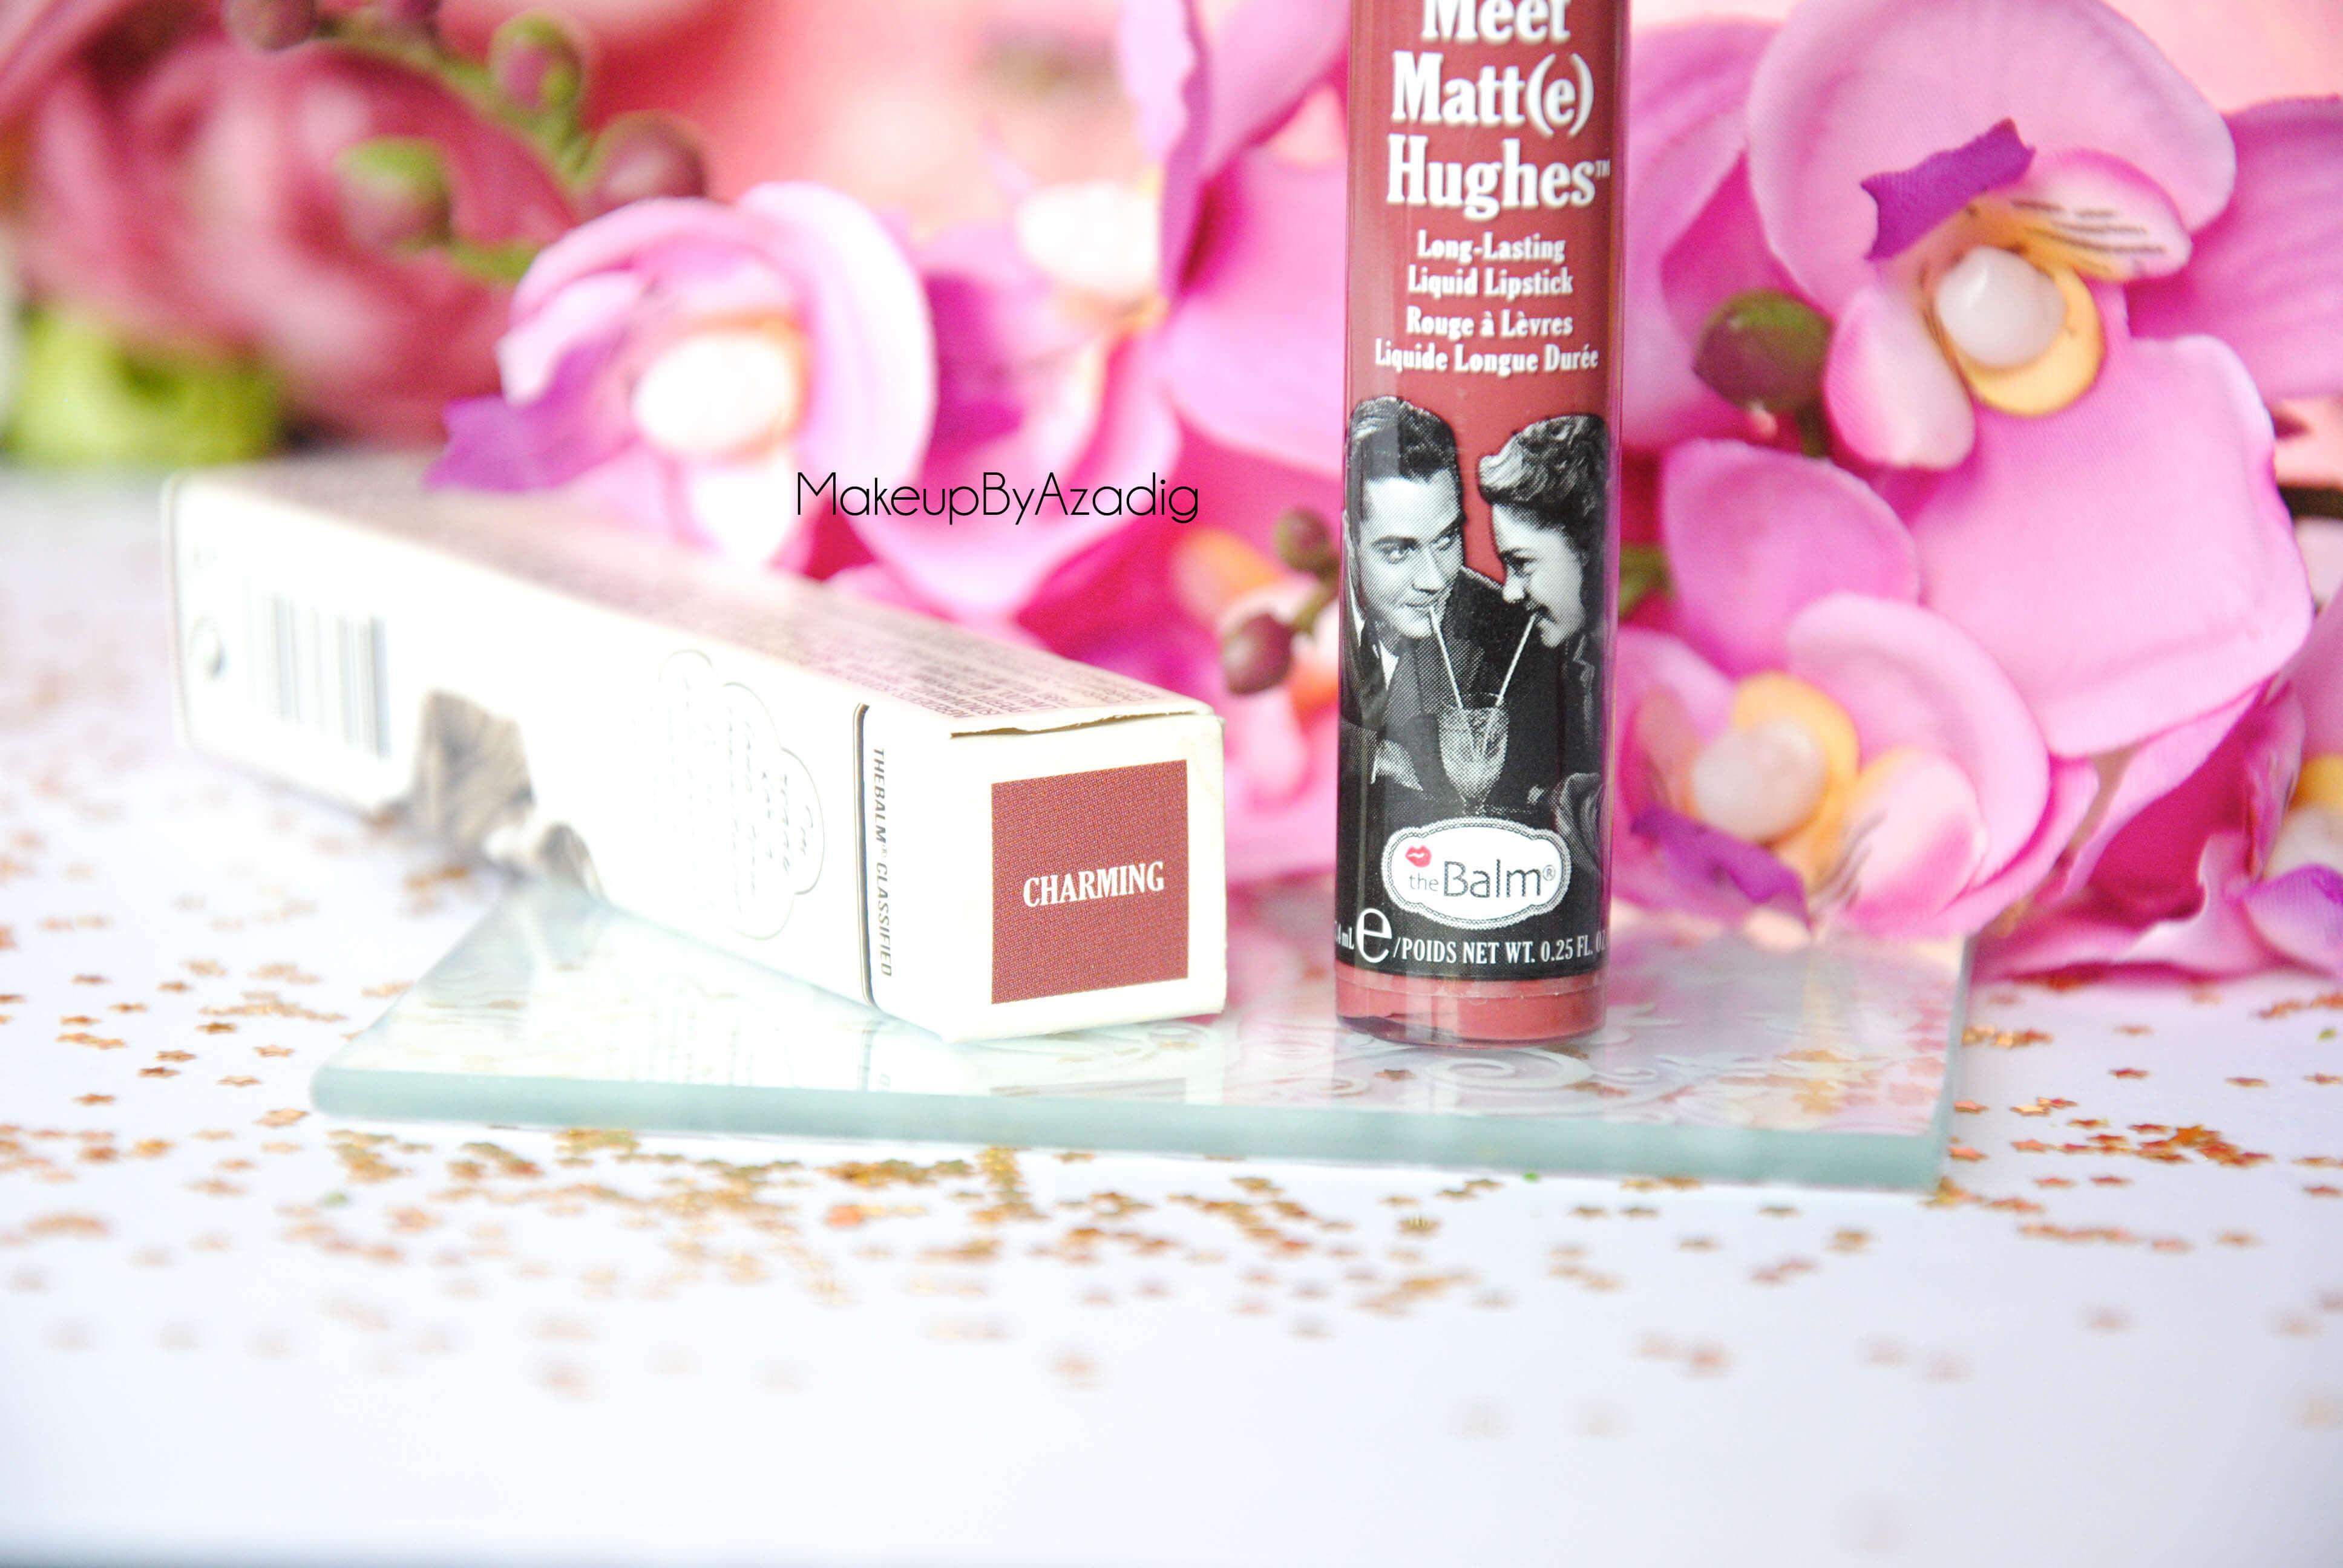 meet-matte-hughes-the-balm-charming-makeupbyazadig-troyes-paris-rouge-levres-liquide-swatch-review-avis-teinte